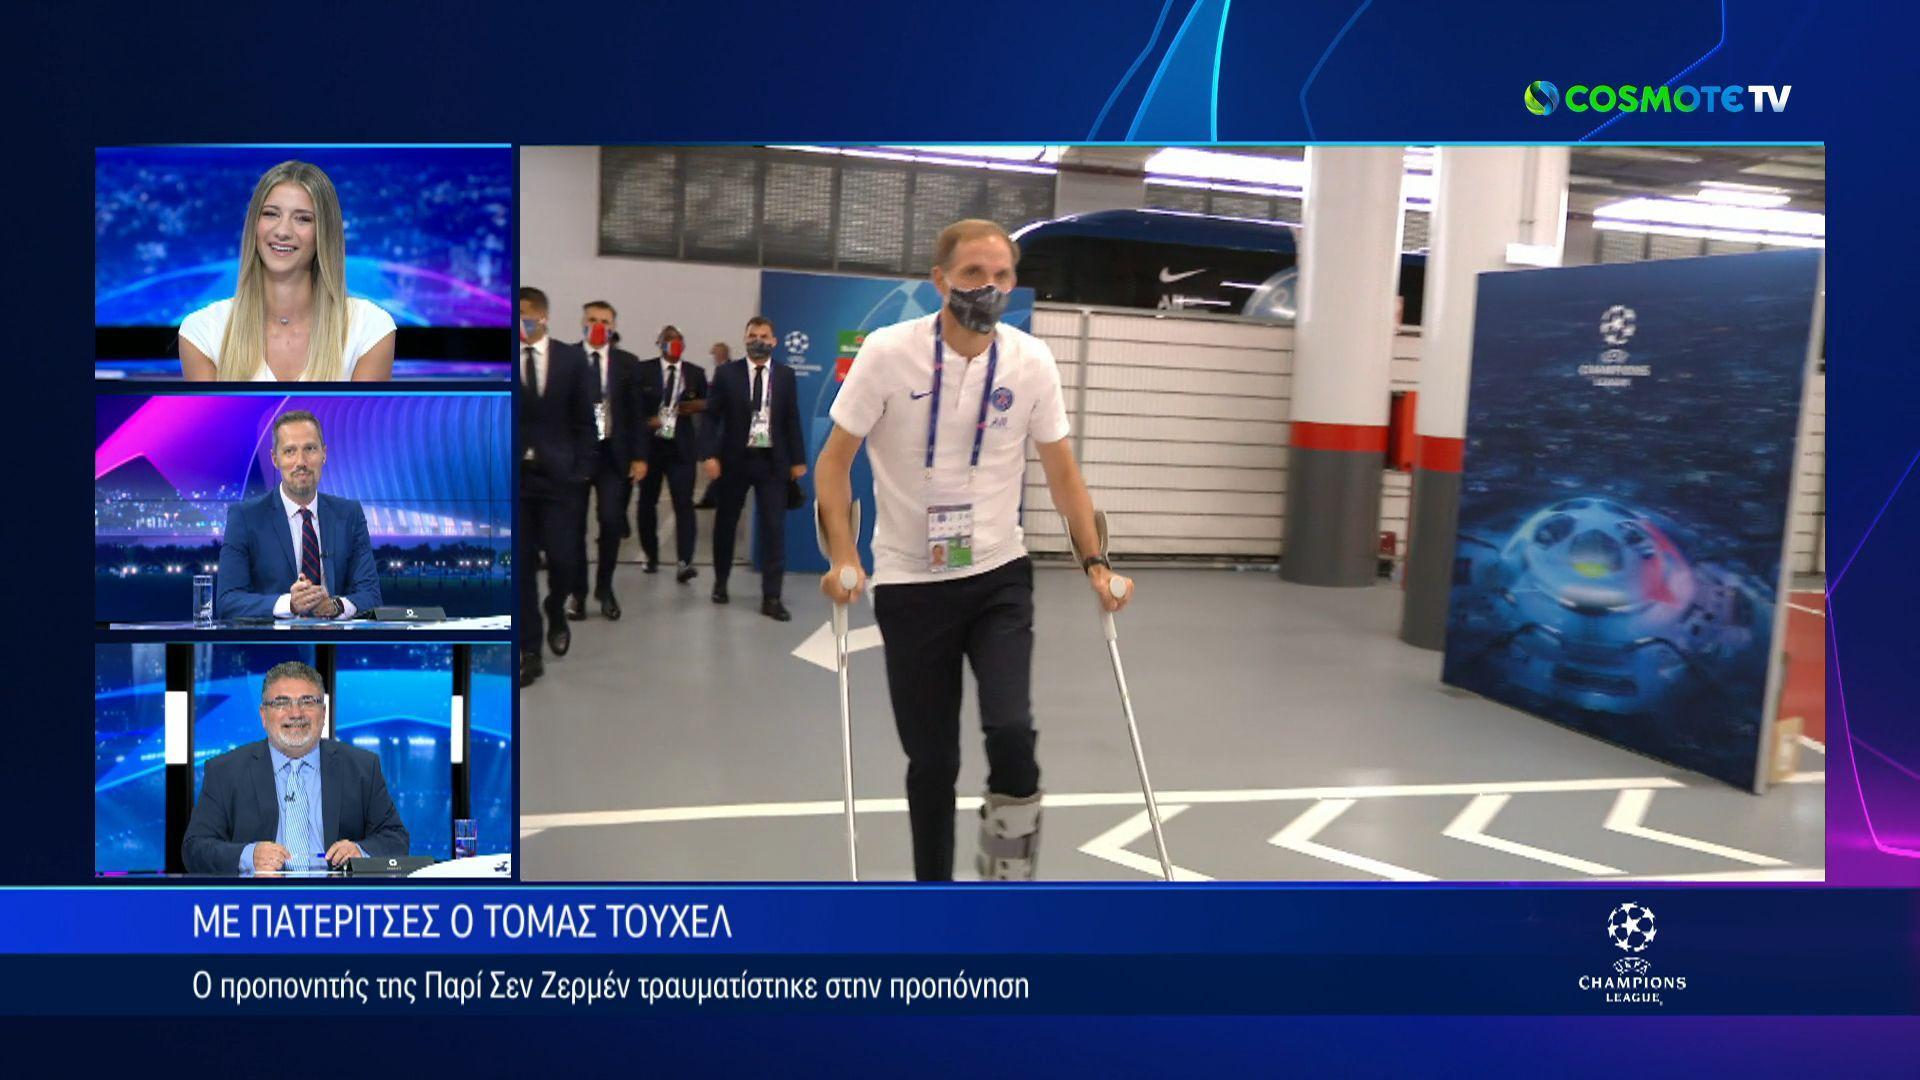 UEFA: Βαρύ πρόστιμο στην Παρί γιατί  ο Τούχελ περπατάει με πατερίτσες!